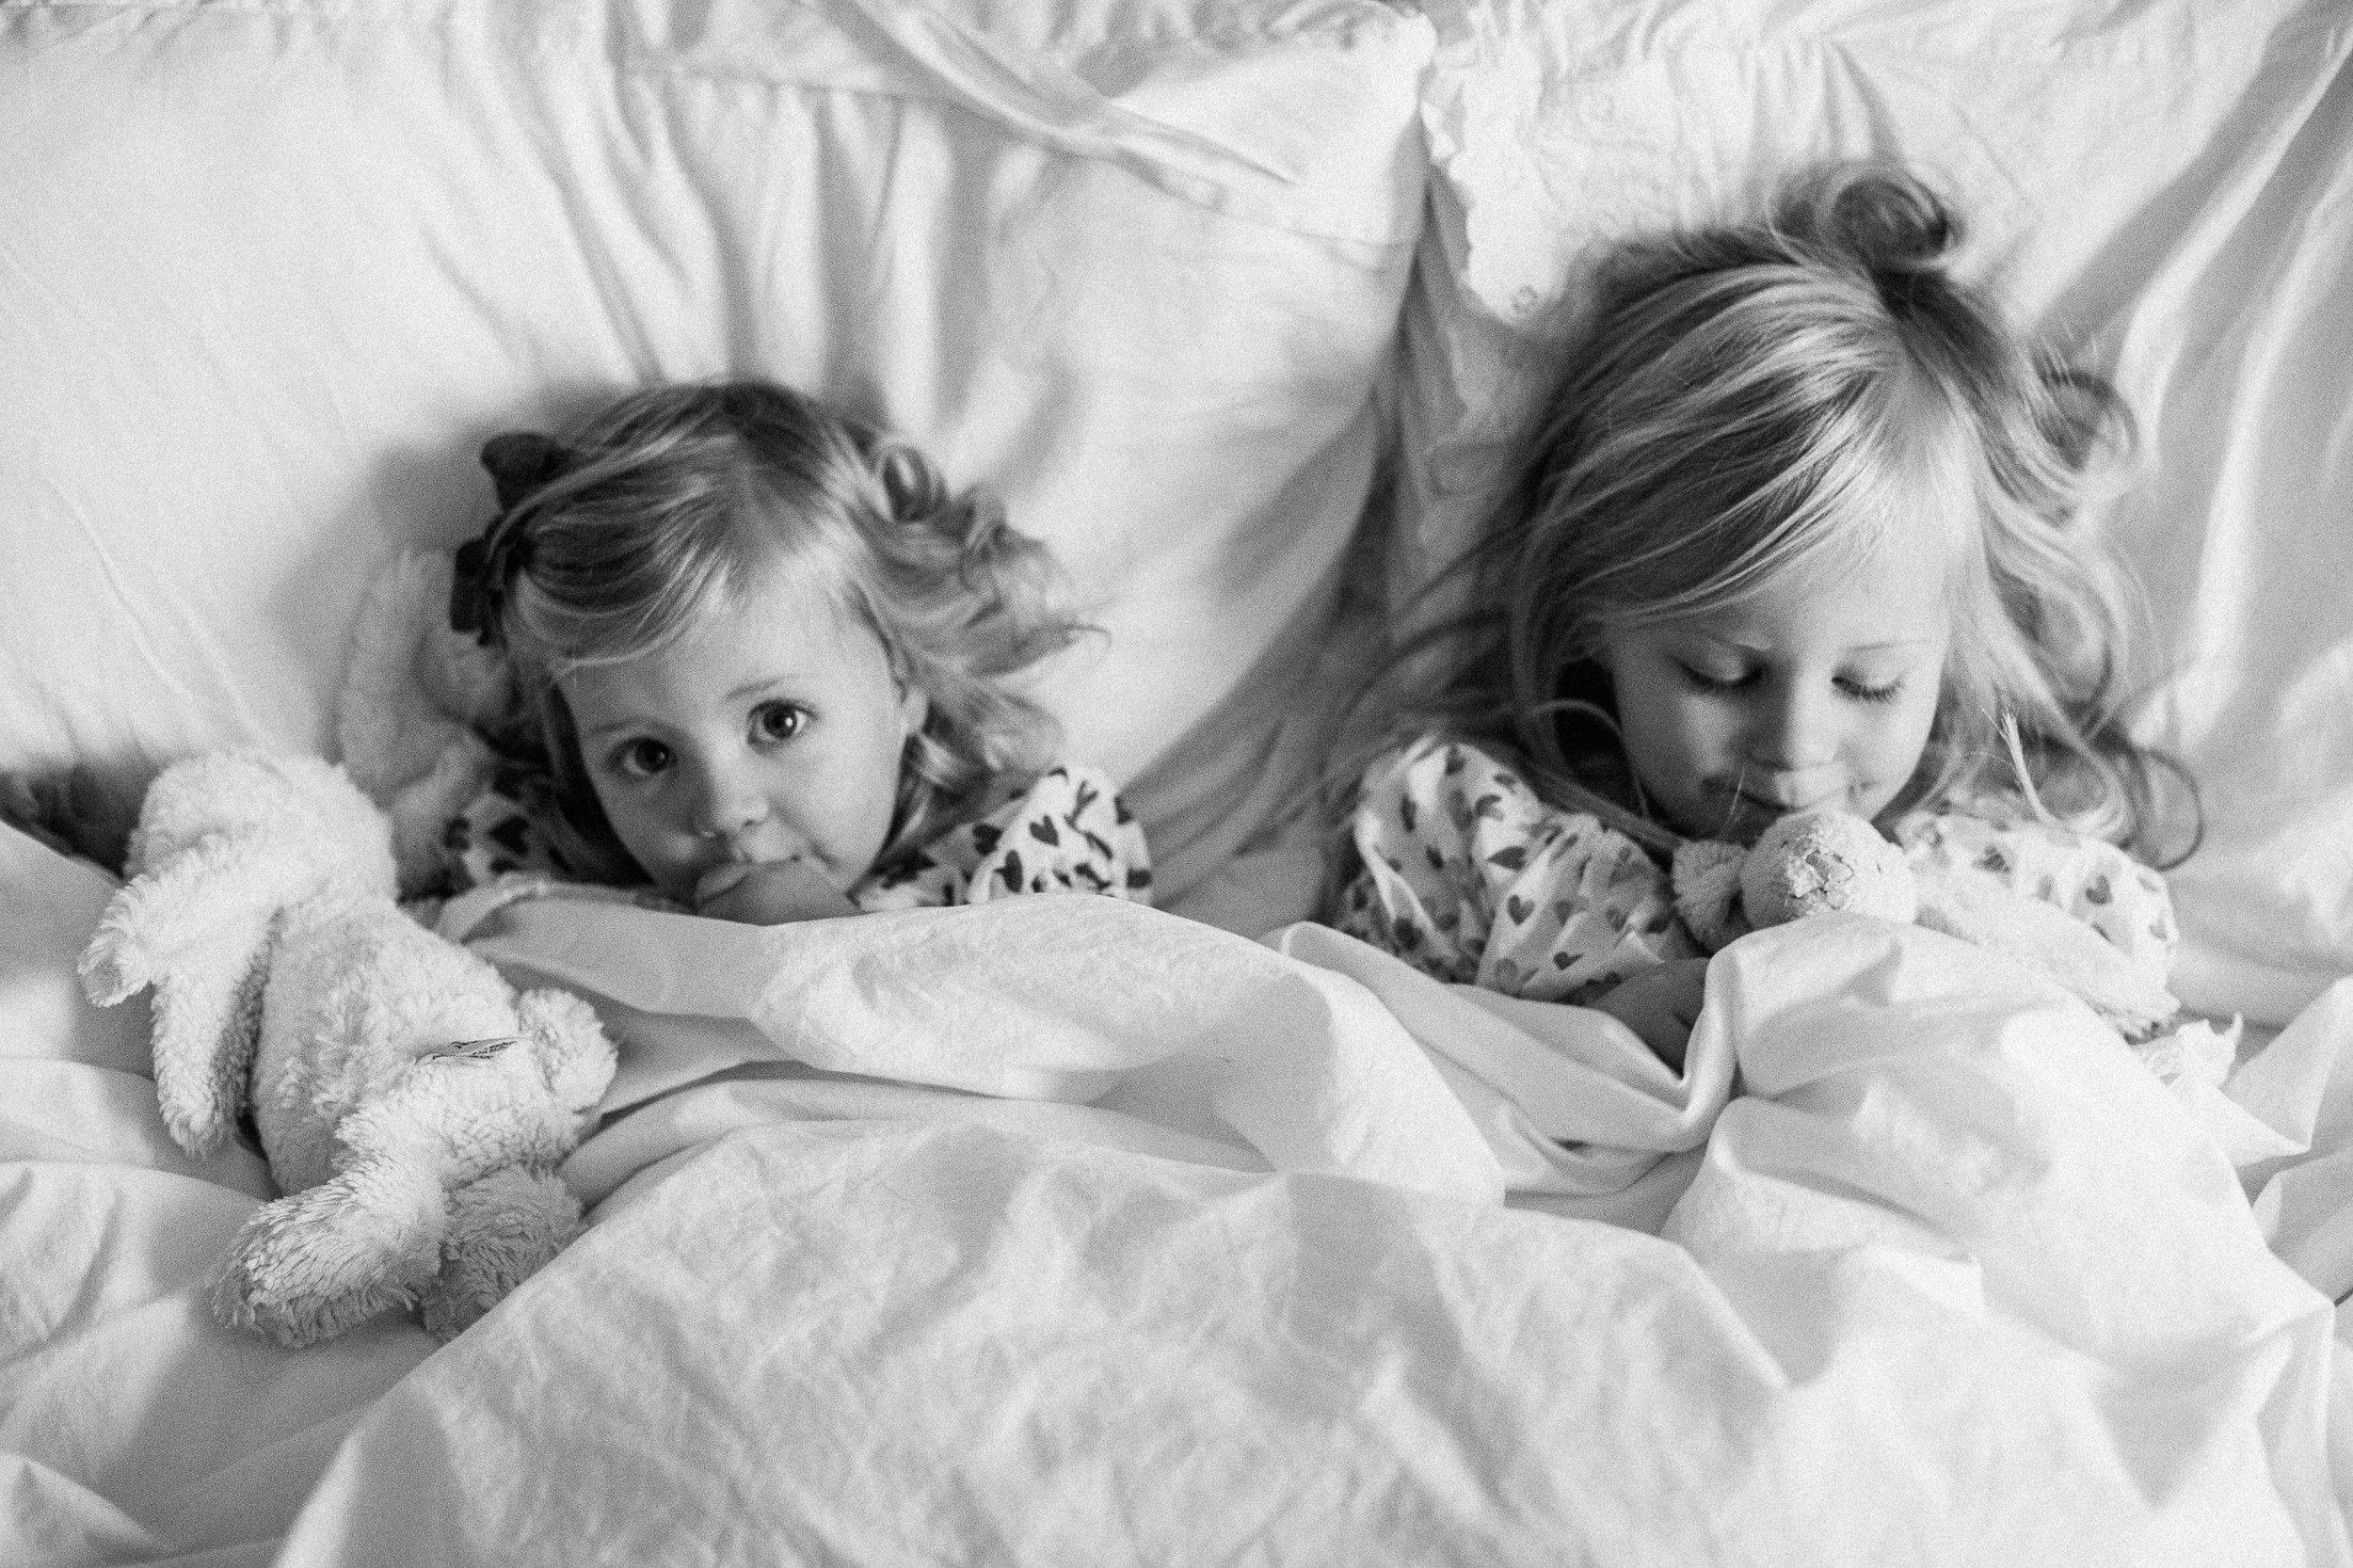 childrens photographer venice beach -21347.jpg